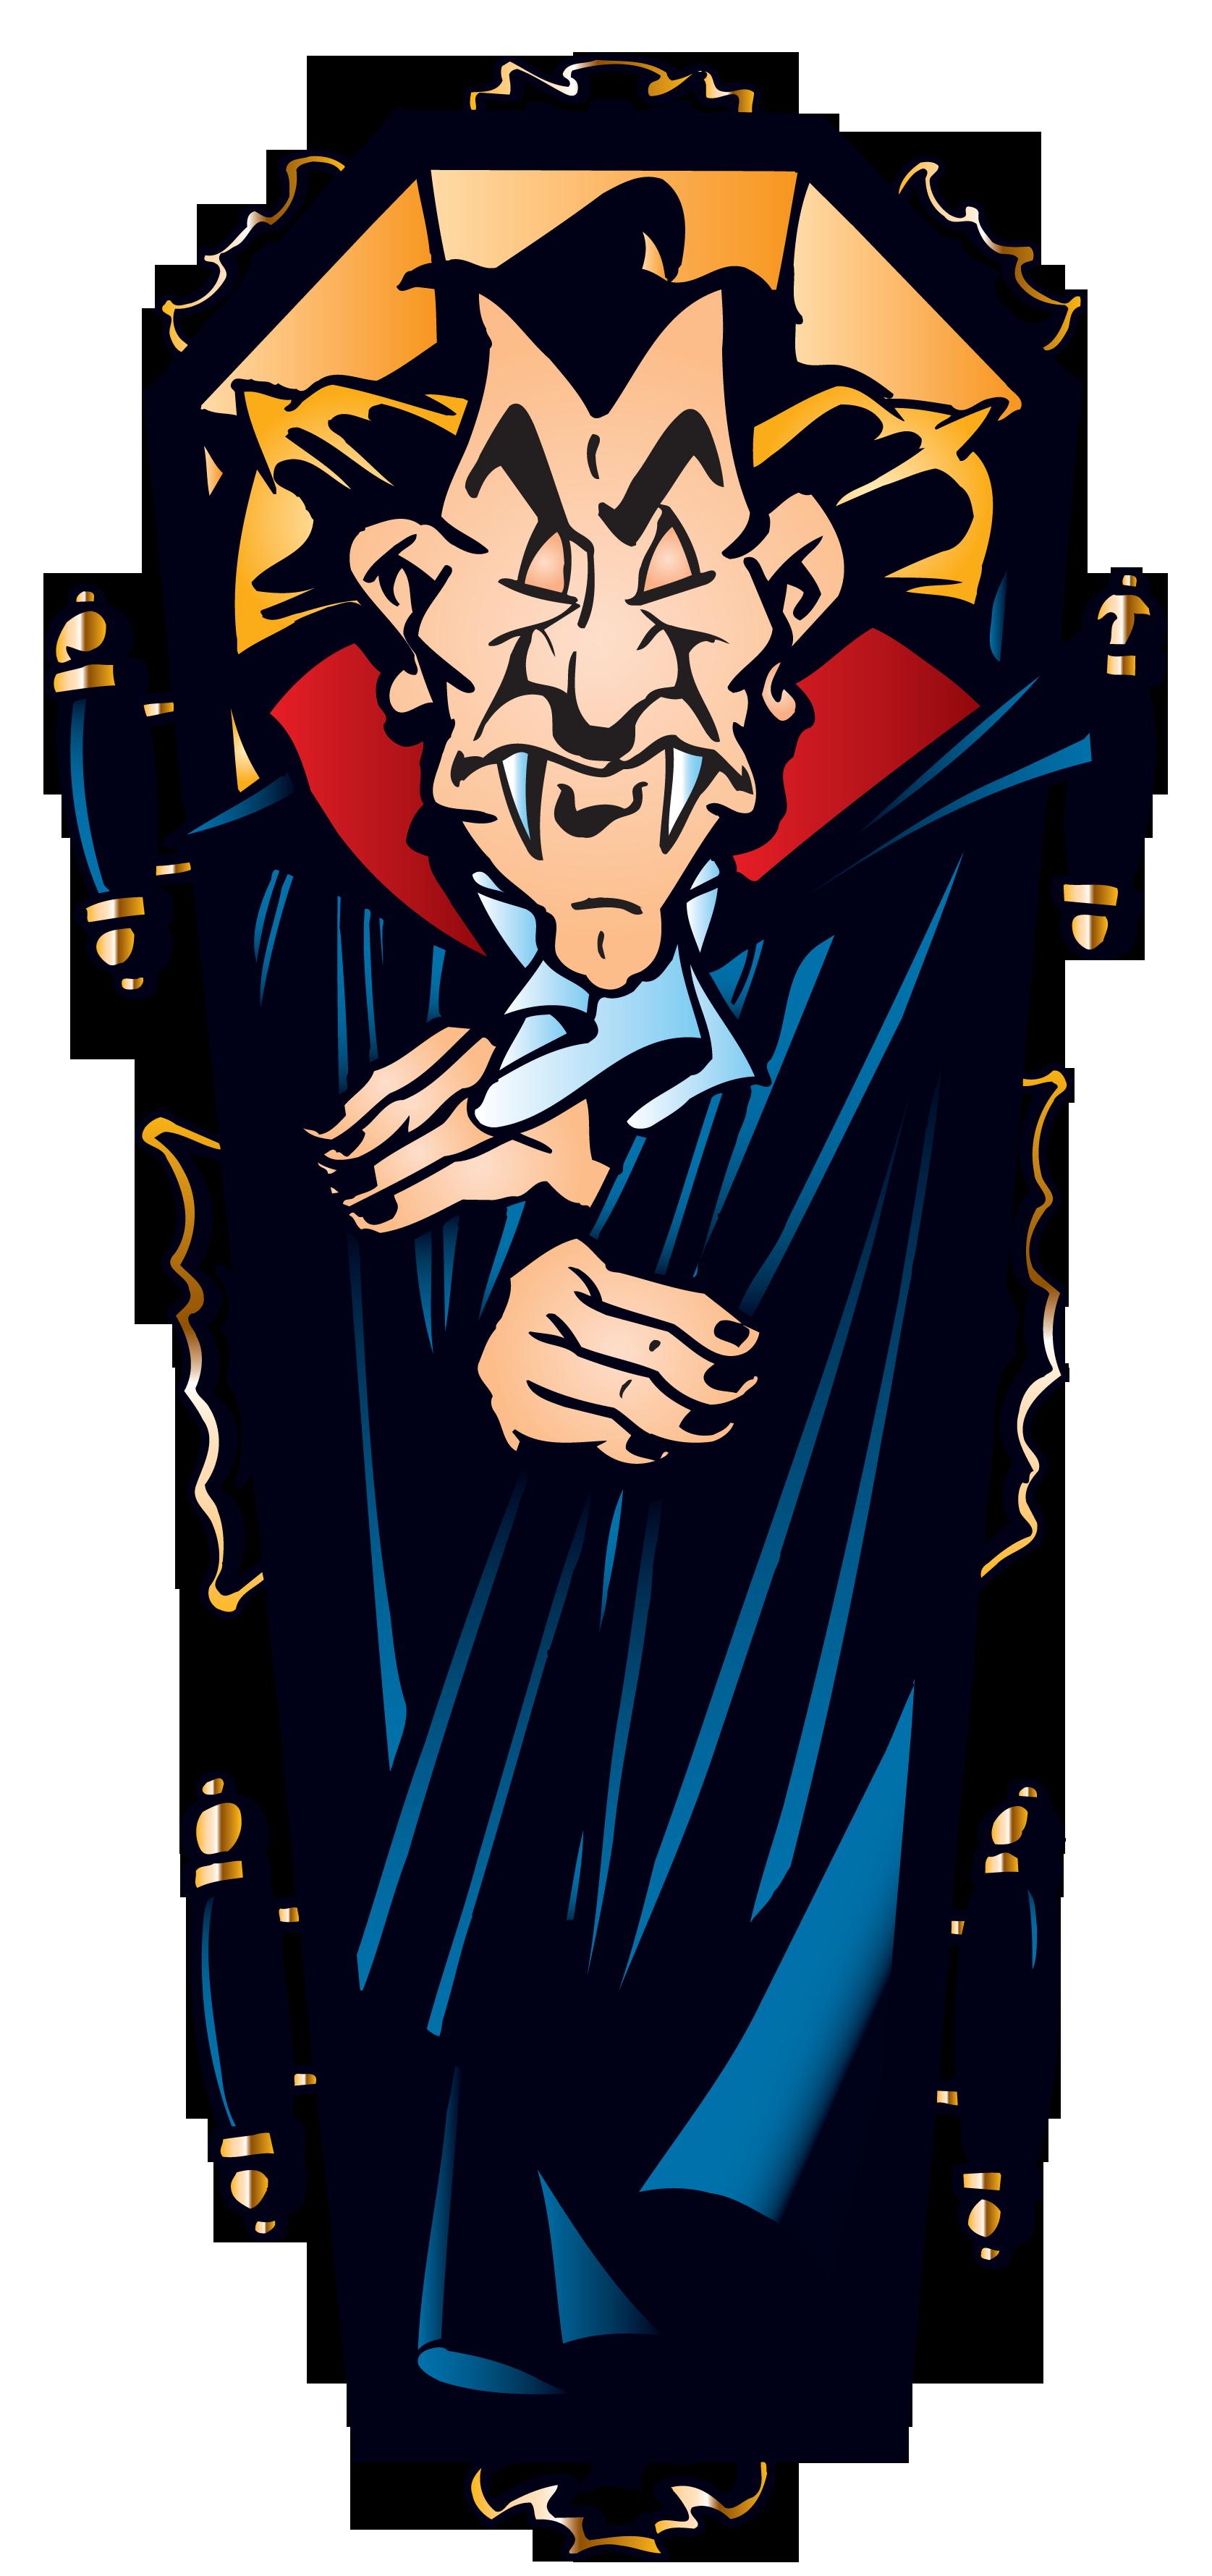 Vampire in png gallery. Coffin clipart halloween